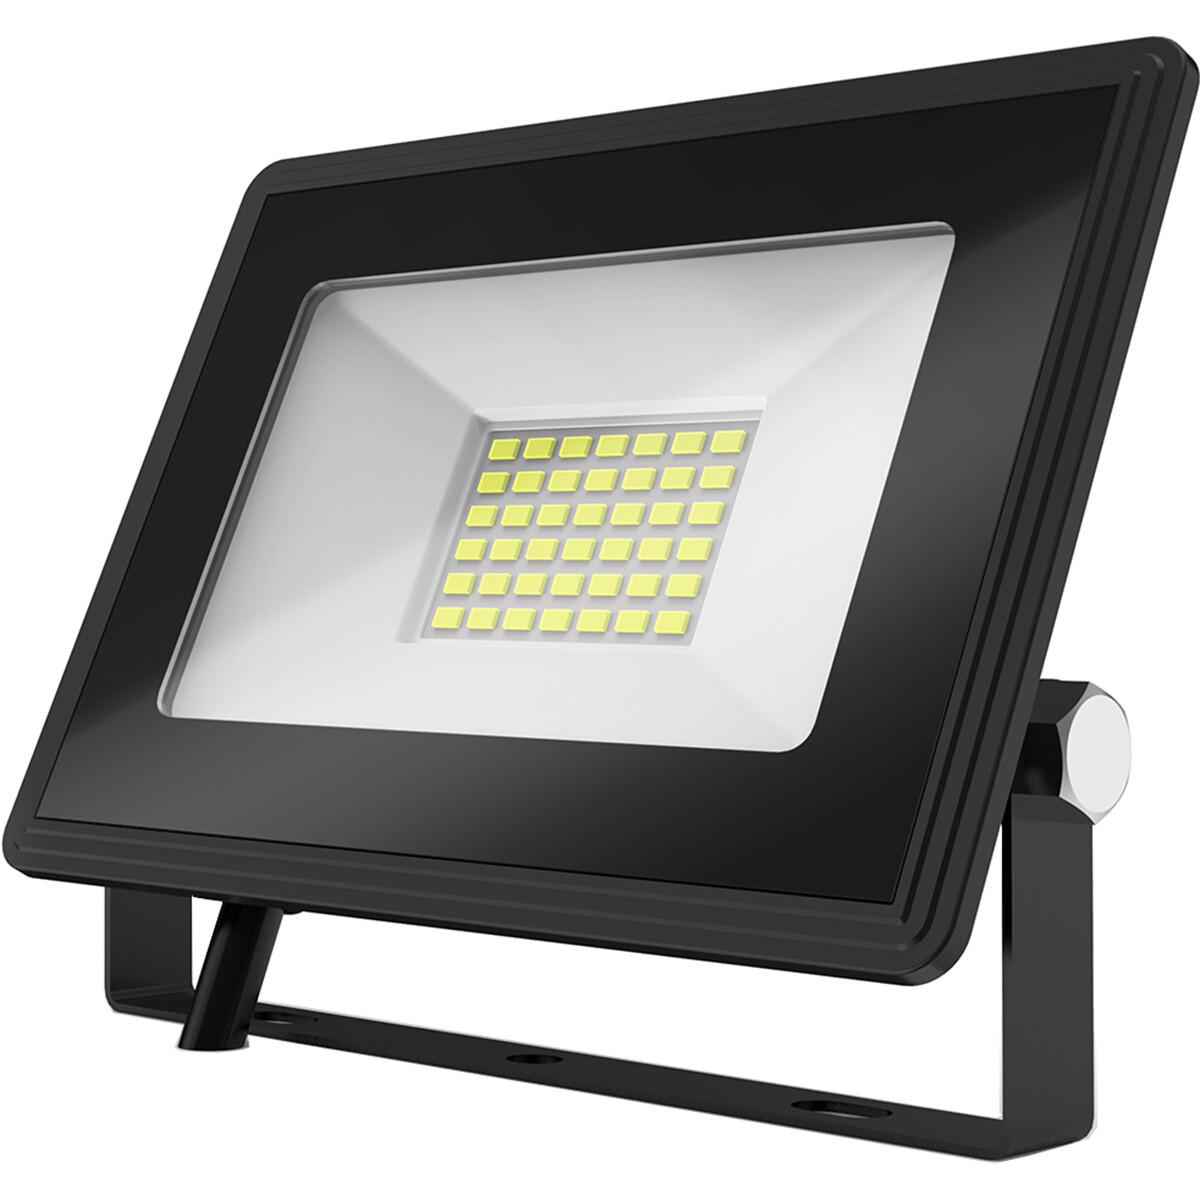 LED Bouwlamp 30 Watt - LED Schijnwerper - Aigi Iglo - Helder/Koud Wit 6400K - Waterdicht IP65 - Mat Zwart - Aluminium